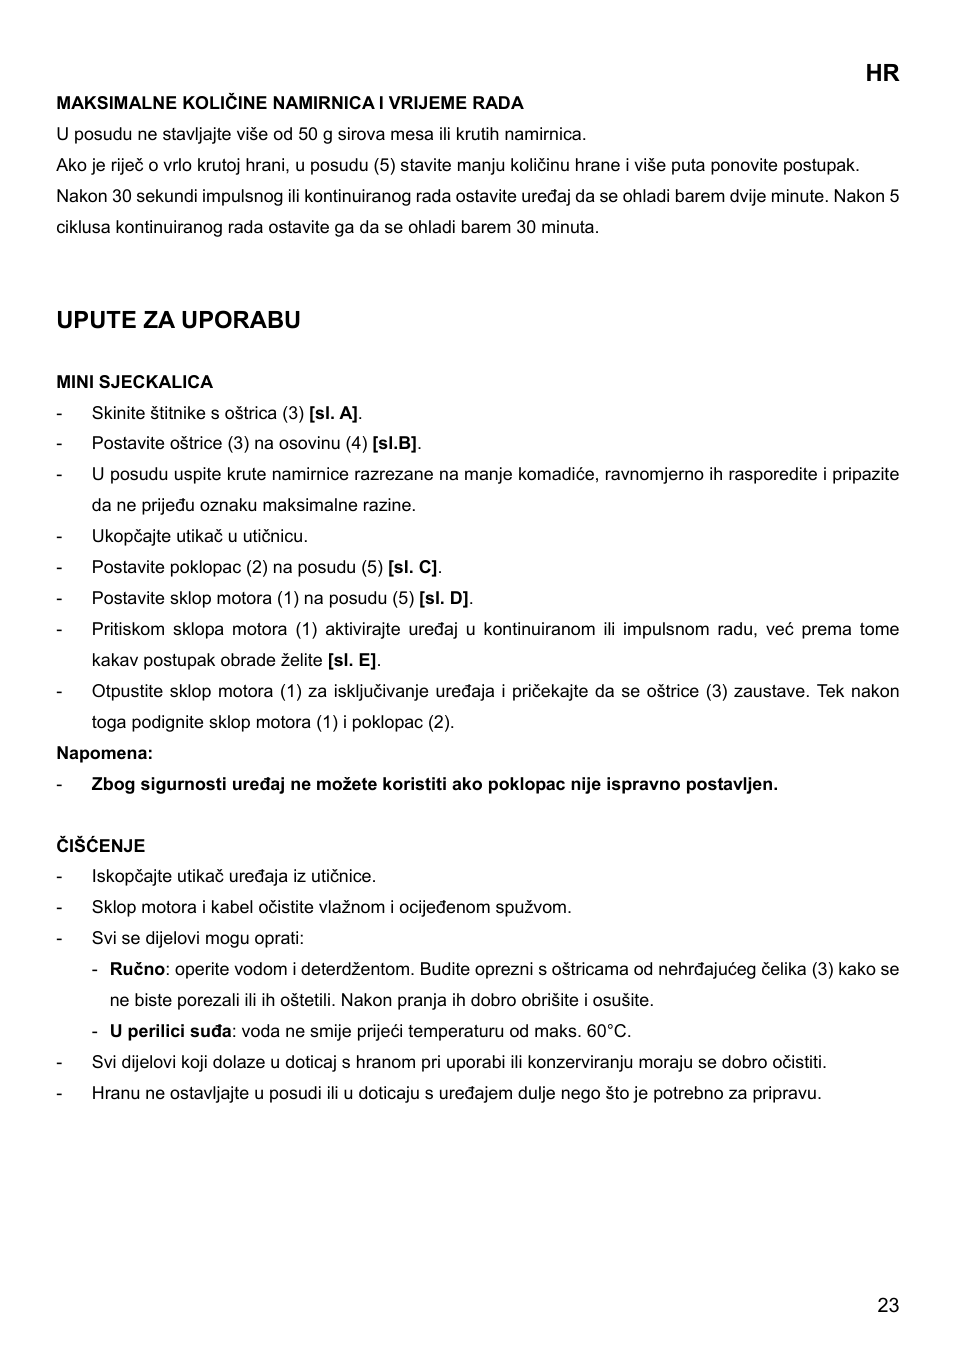 2010 holden commodore sv6 ve manual 6 Array - up rabu ute za upo imetec  bimbo hm3 user manual page 25 30 rh